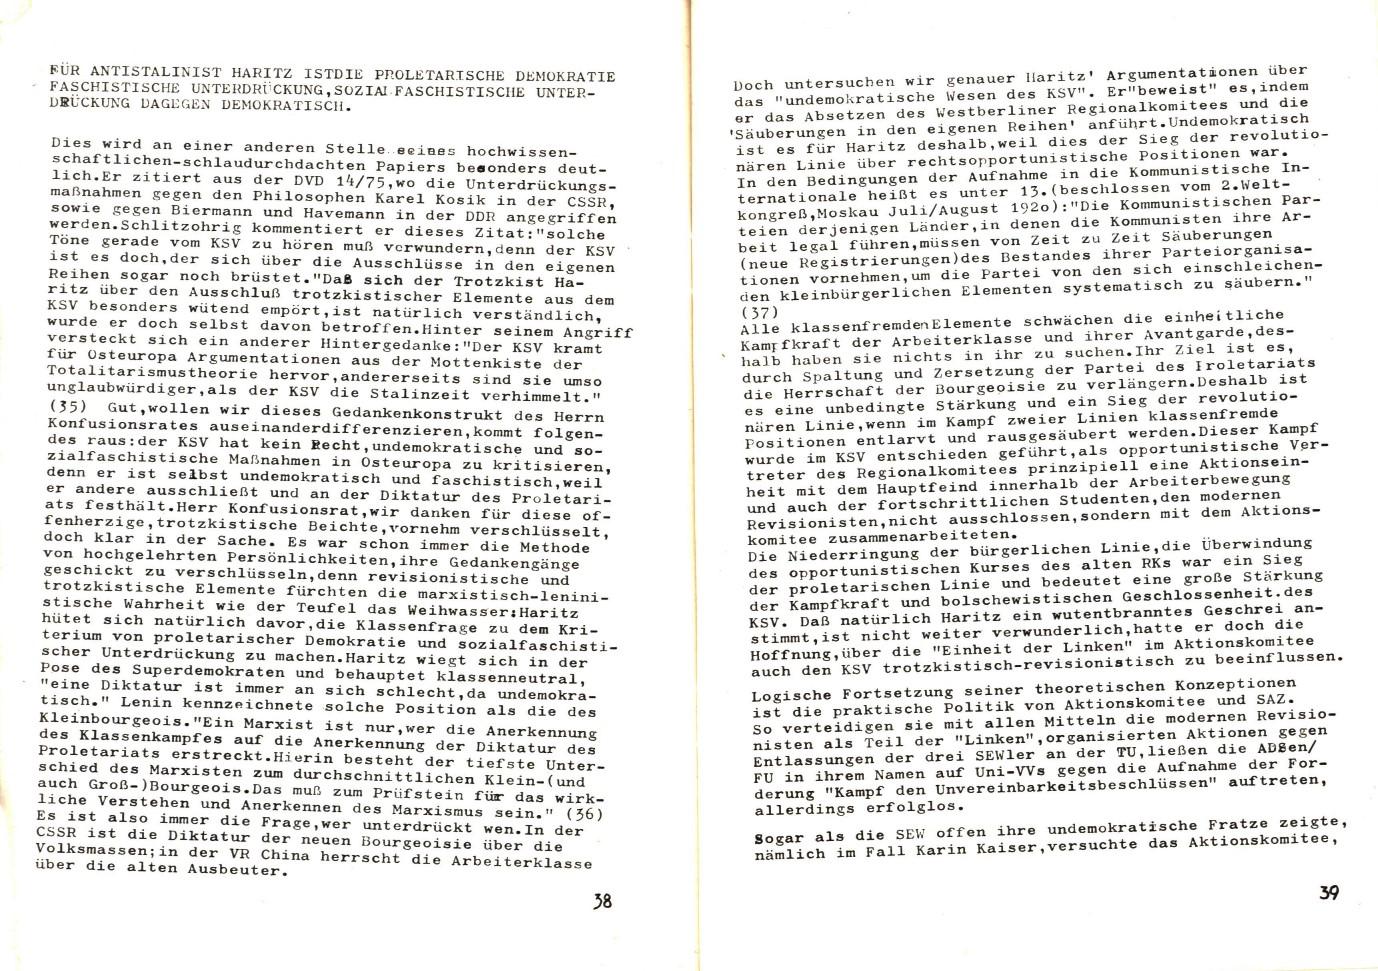 Berlin_KSV_1975_Dokumente_der_SAZ_21